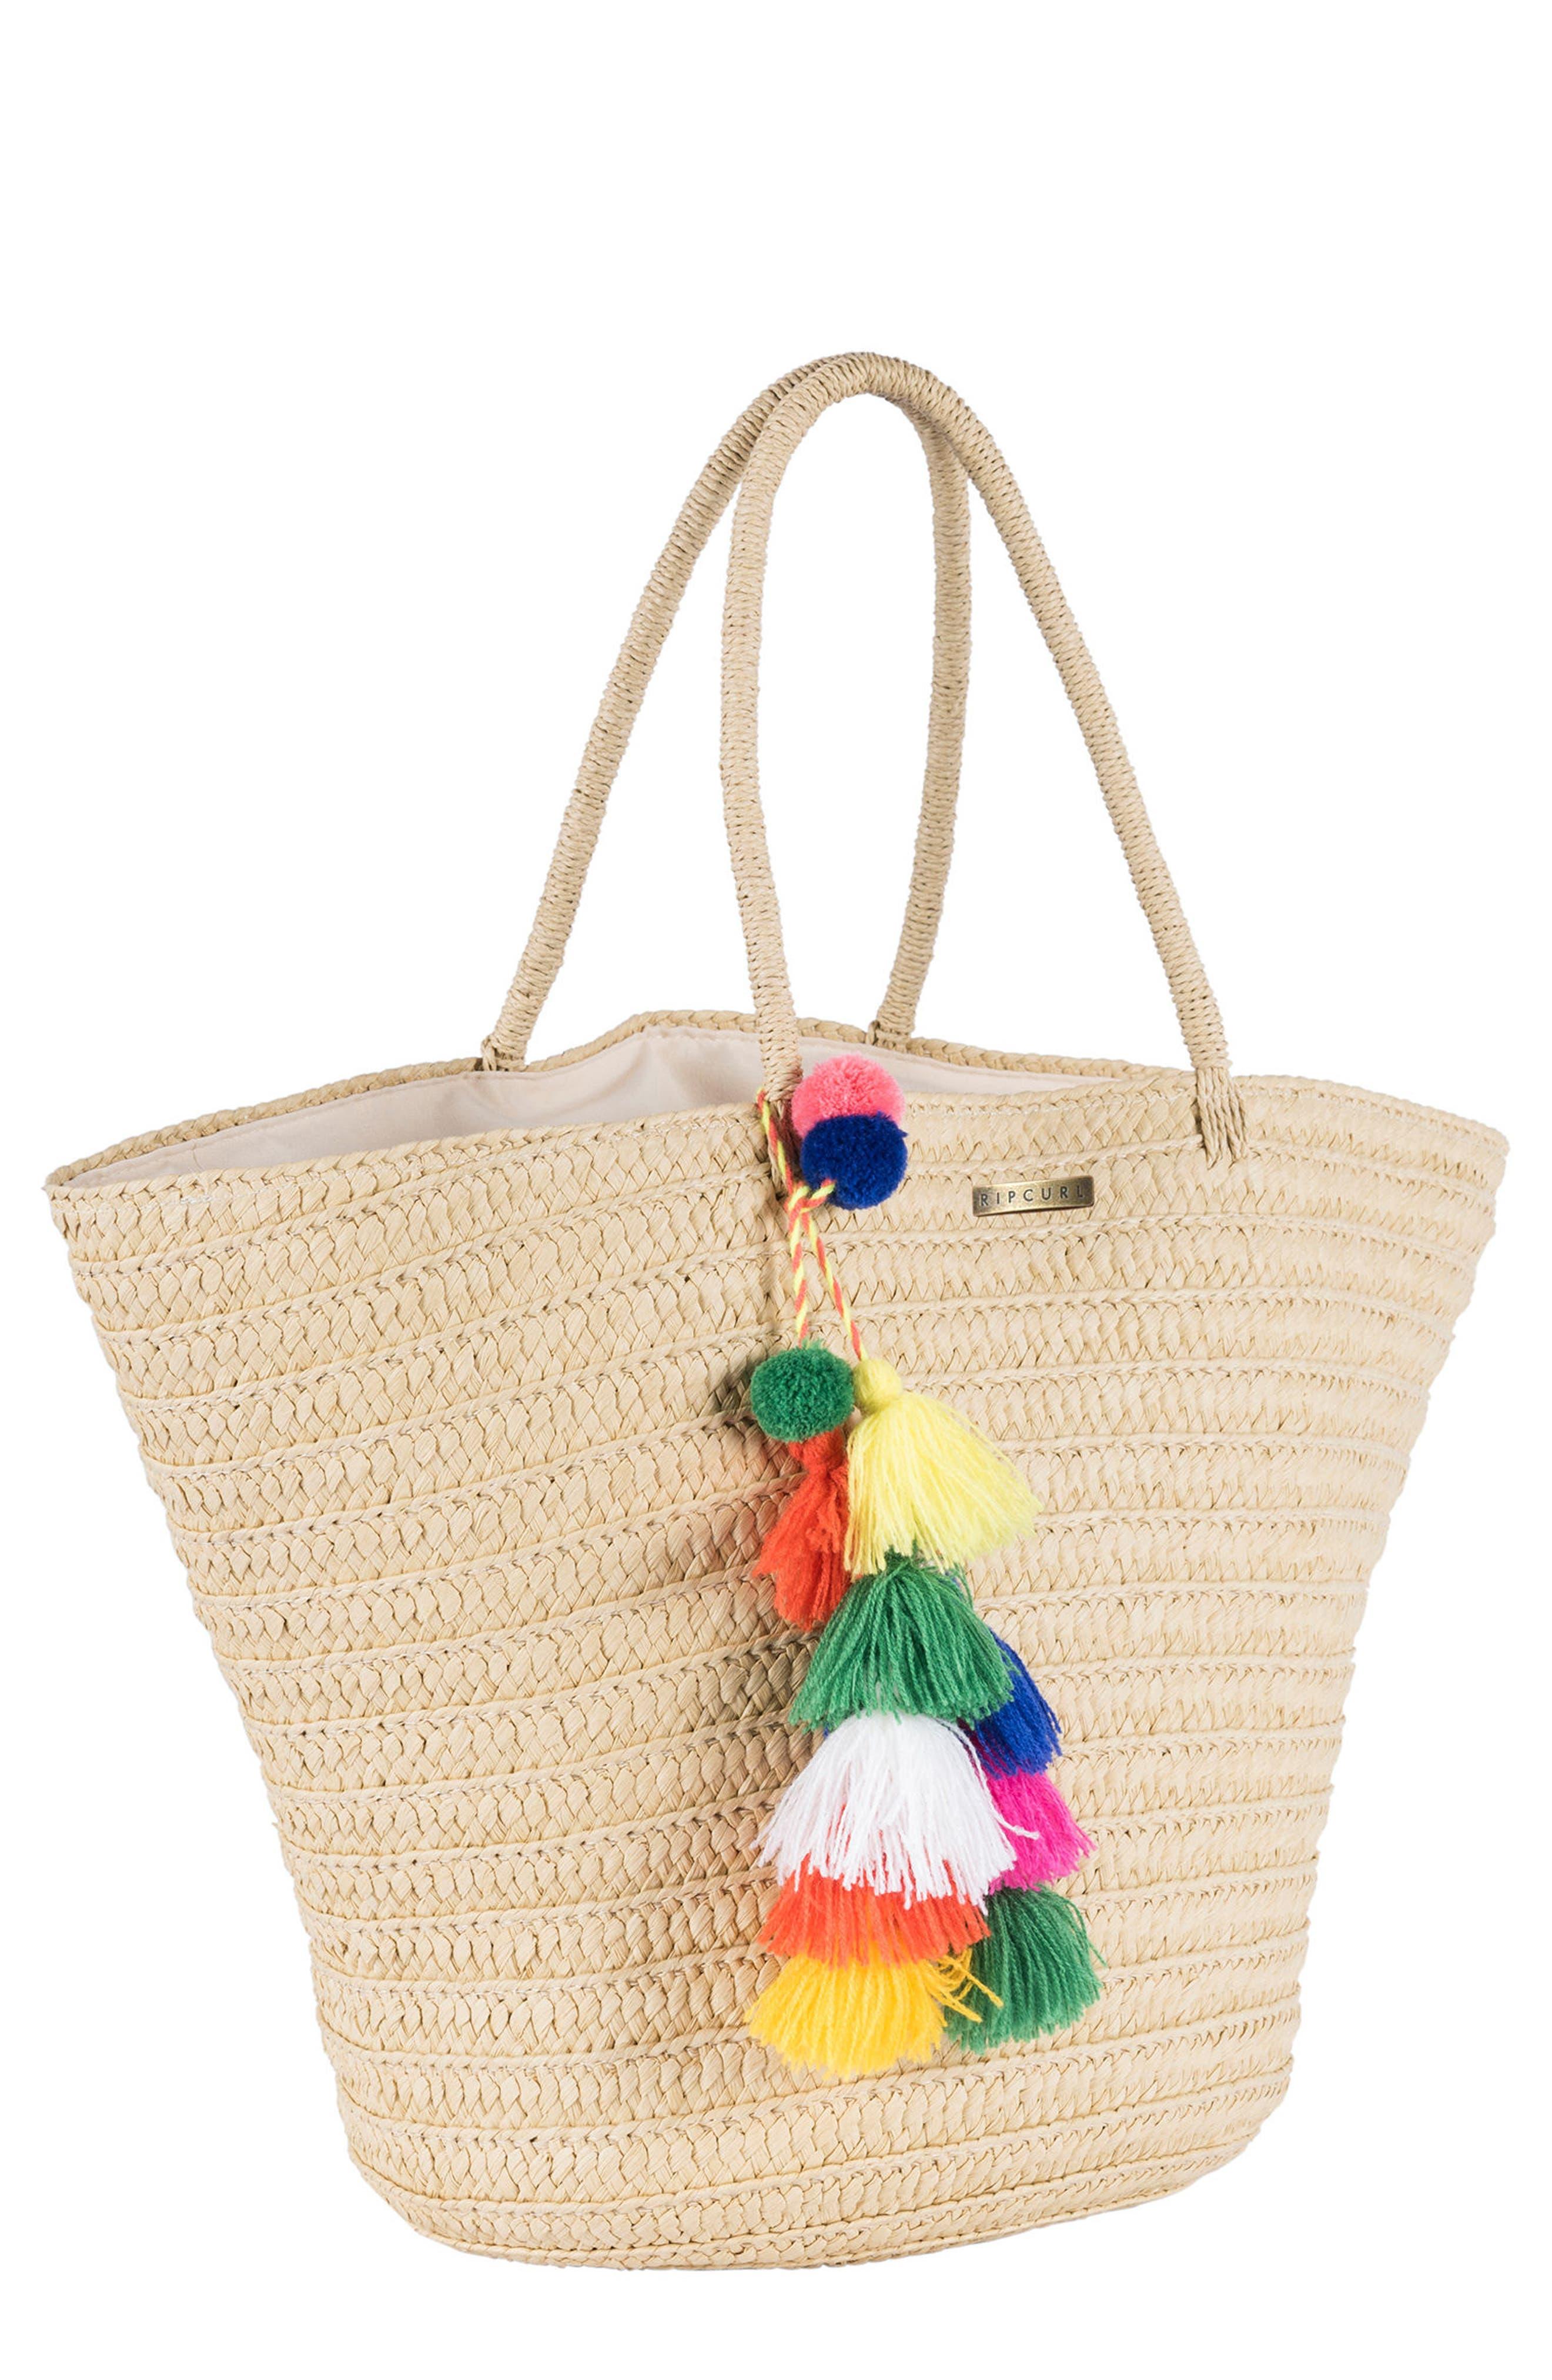 Beach Bazaar Straw Bag,                         Main,                         color,